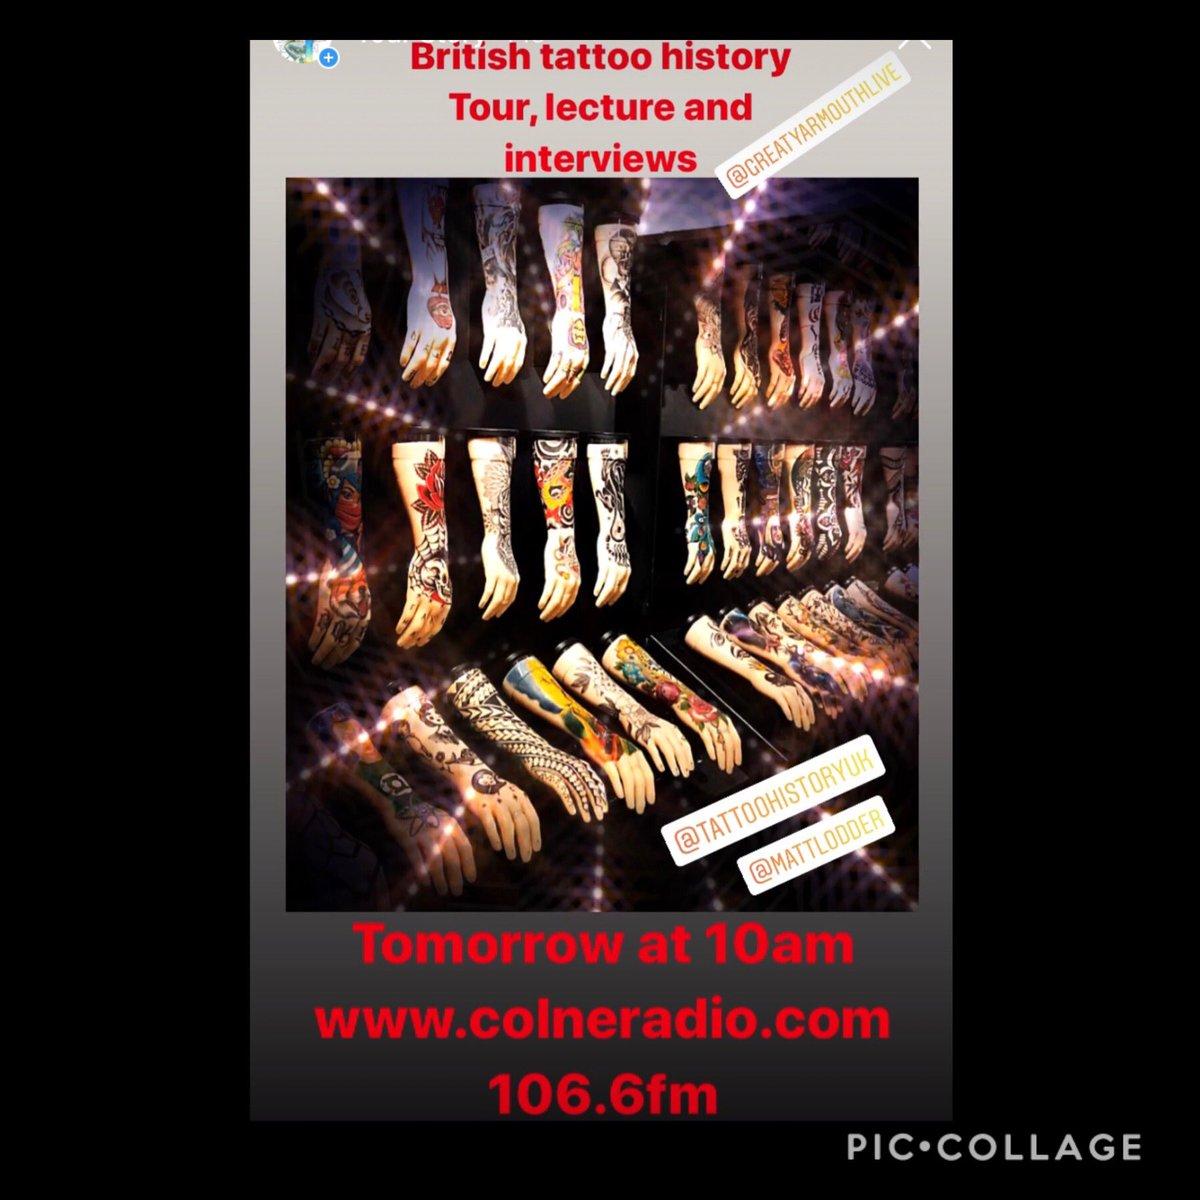 Tomorrow at 10am! #radio #History #tattoolife #tattoohistory #greatyarmouth #timeandtide #maritimeMuseum #supportlocal #supportlocalbusiness #excitingtimes #radiodj #spinthosedisks #PancakeTuesday #TuesdayMotivation #StupidLovepic.twitter.com/EpVRSAna8f